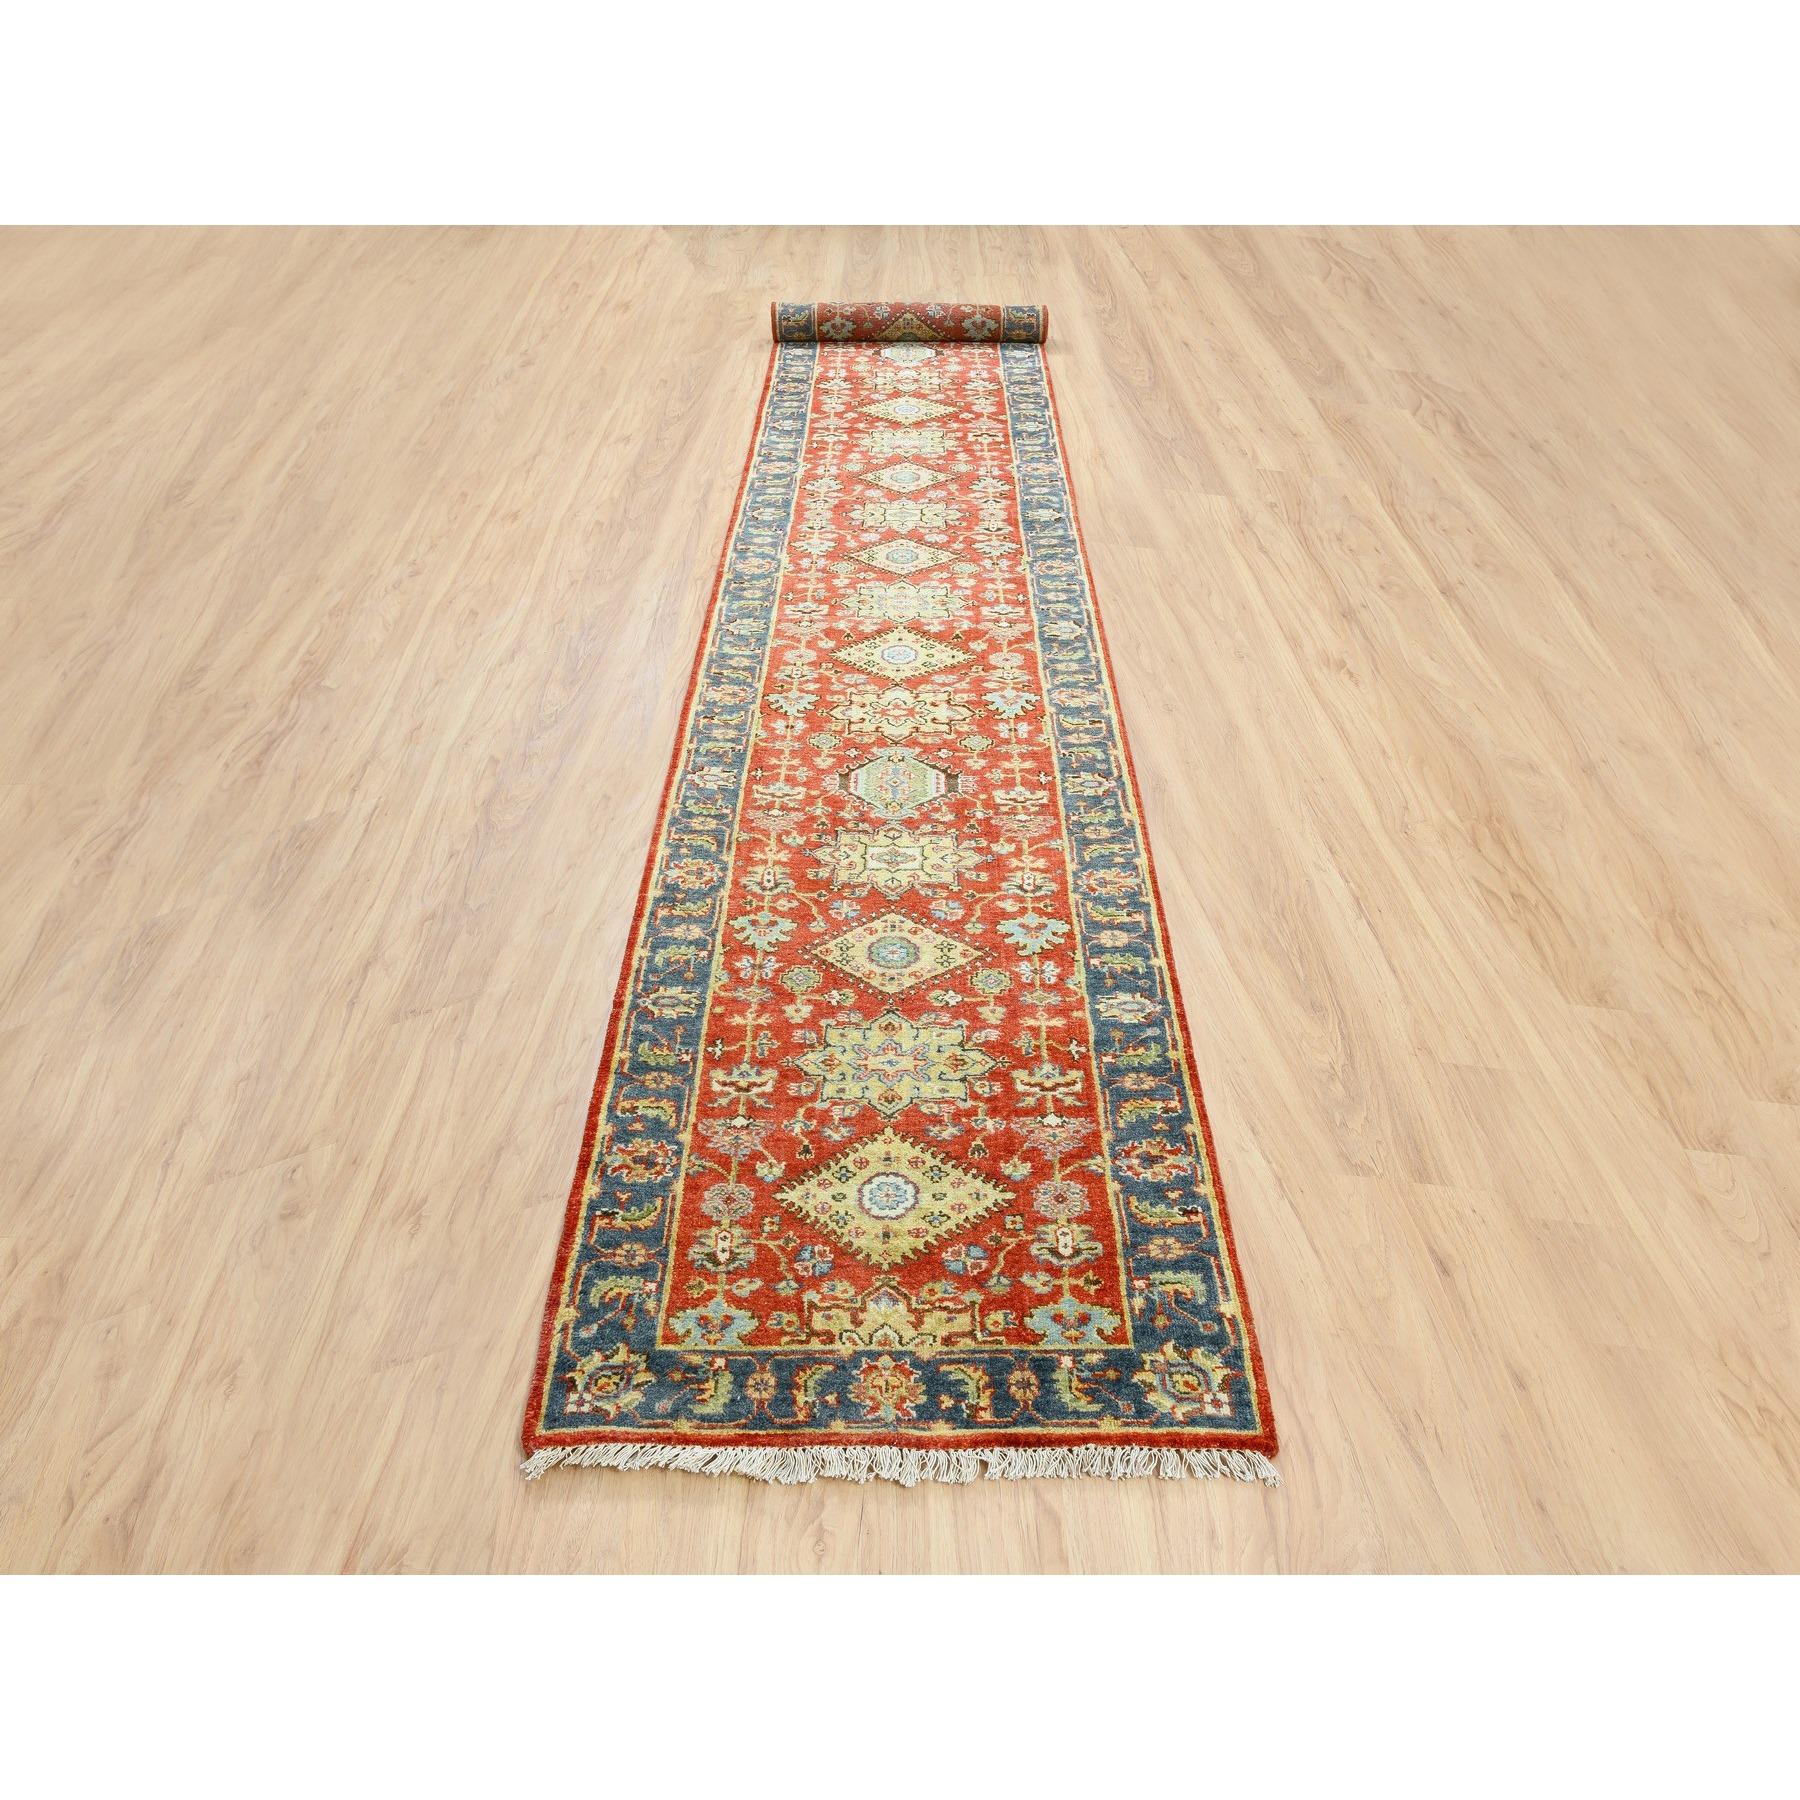 "2'7""x15'10"" Red Karajeh Design Pure Wool Hand Knotted Oriental XL Runner Rug"